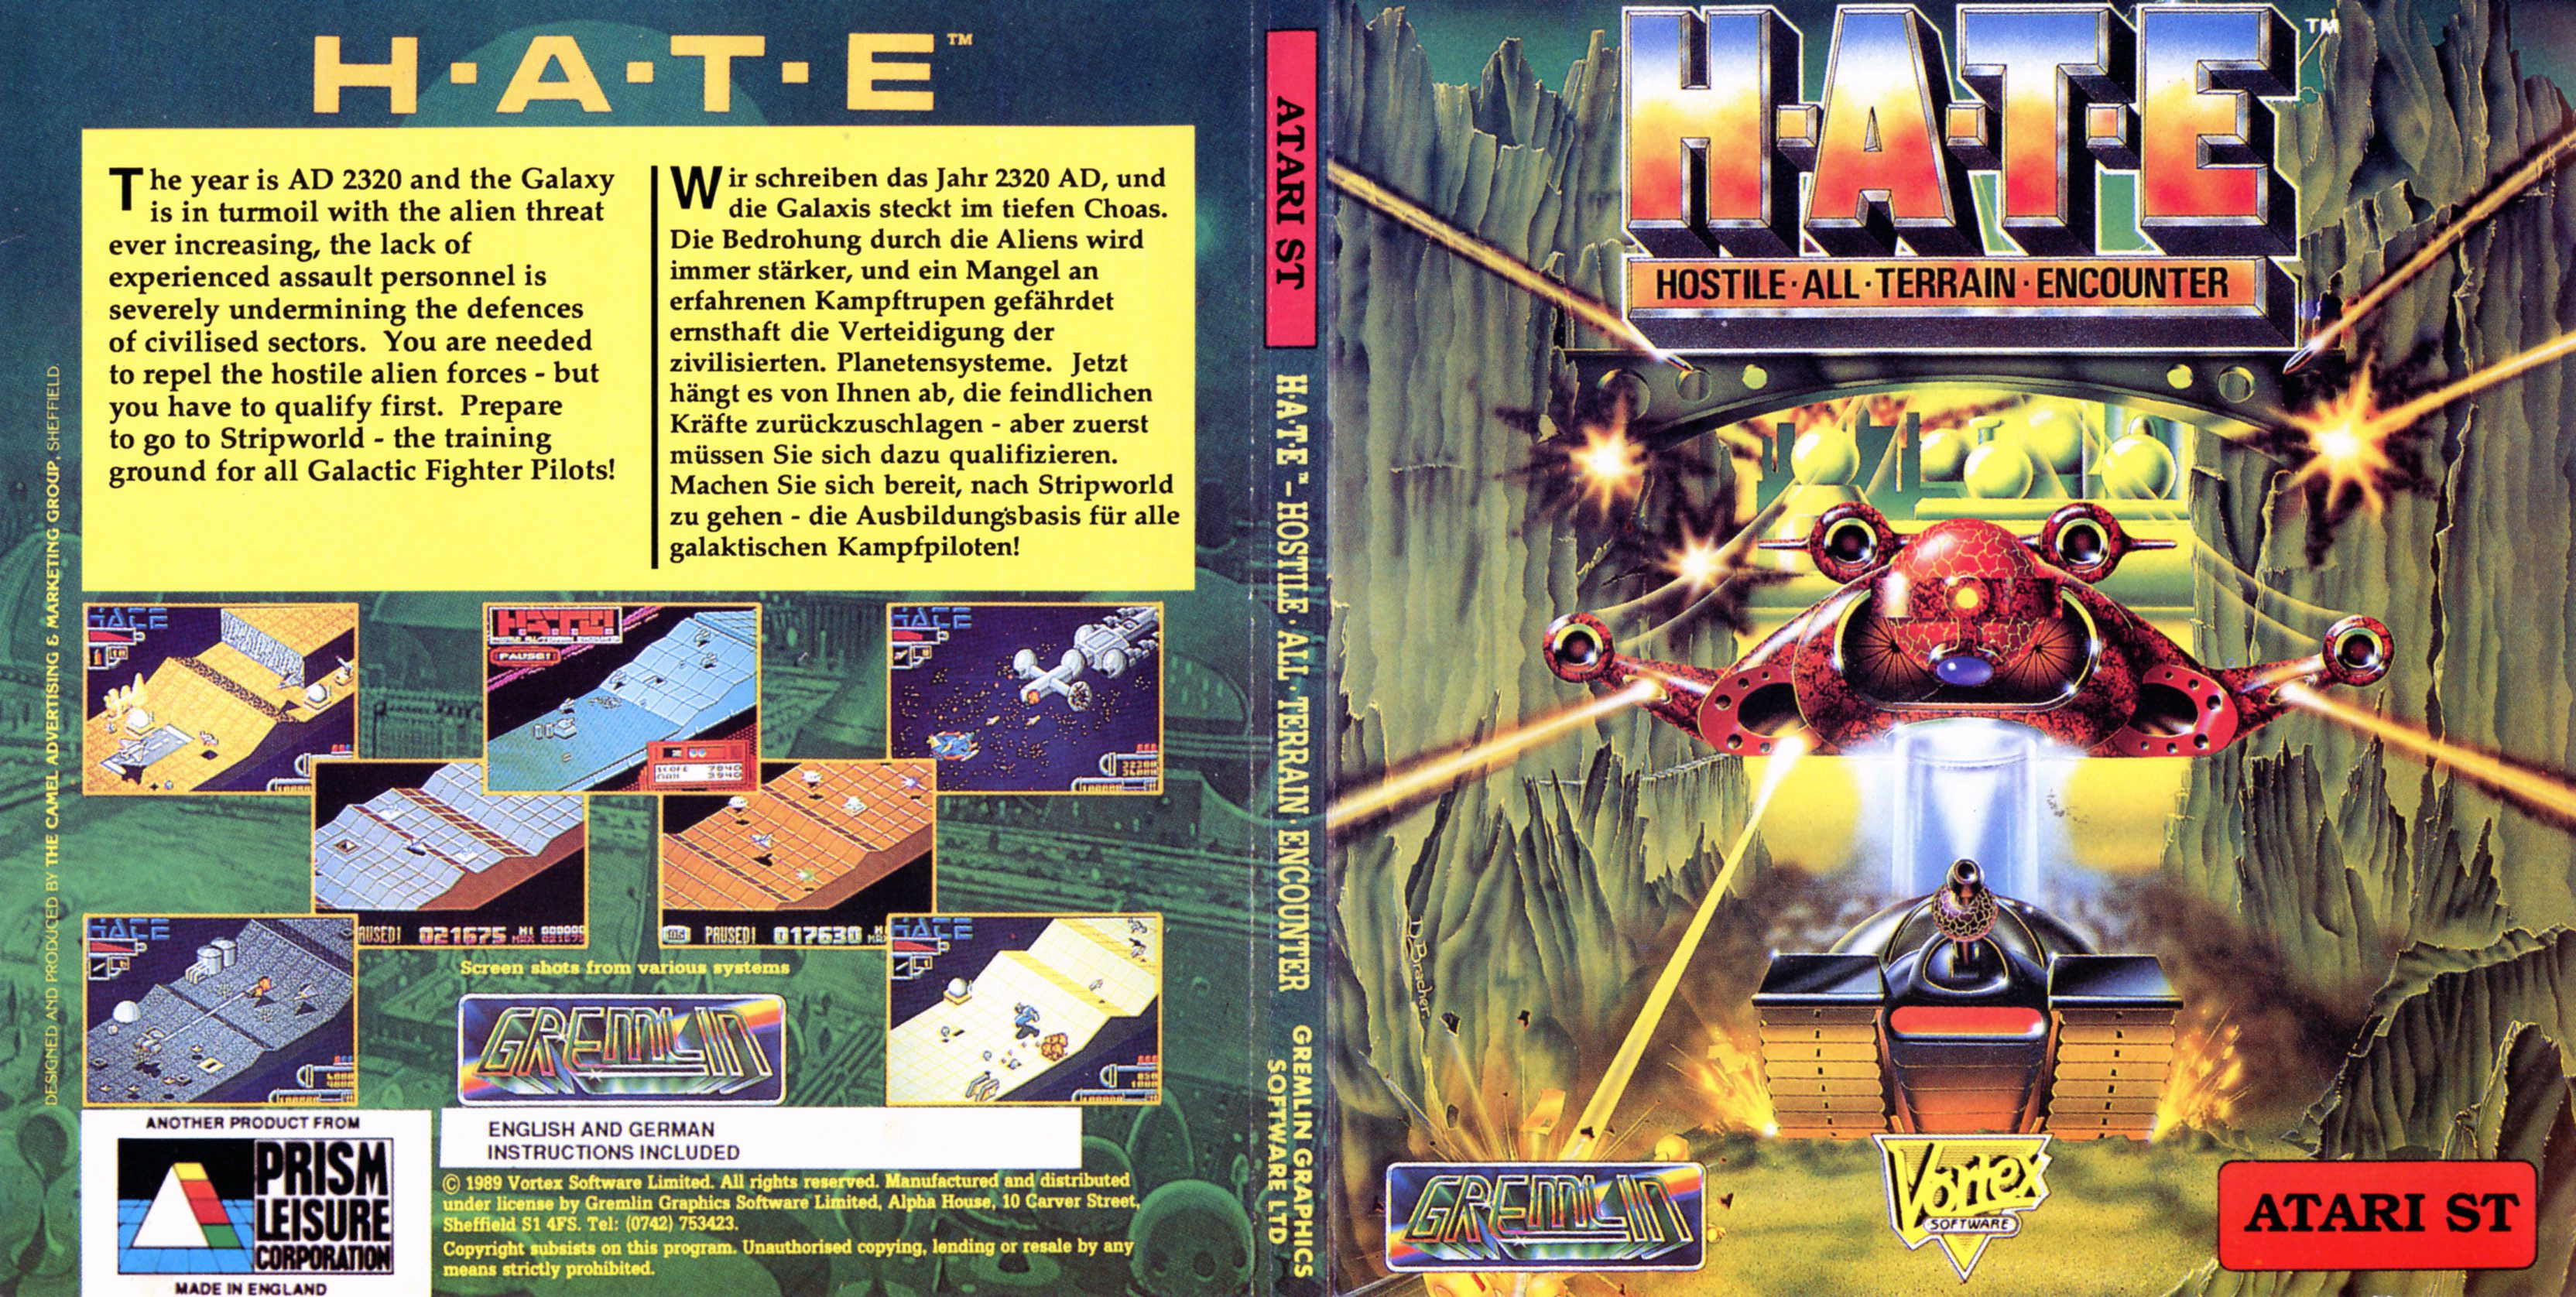 Hostile All Terrain Encounter (HATE) (Atari ST)